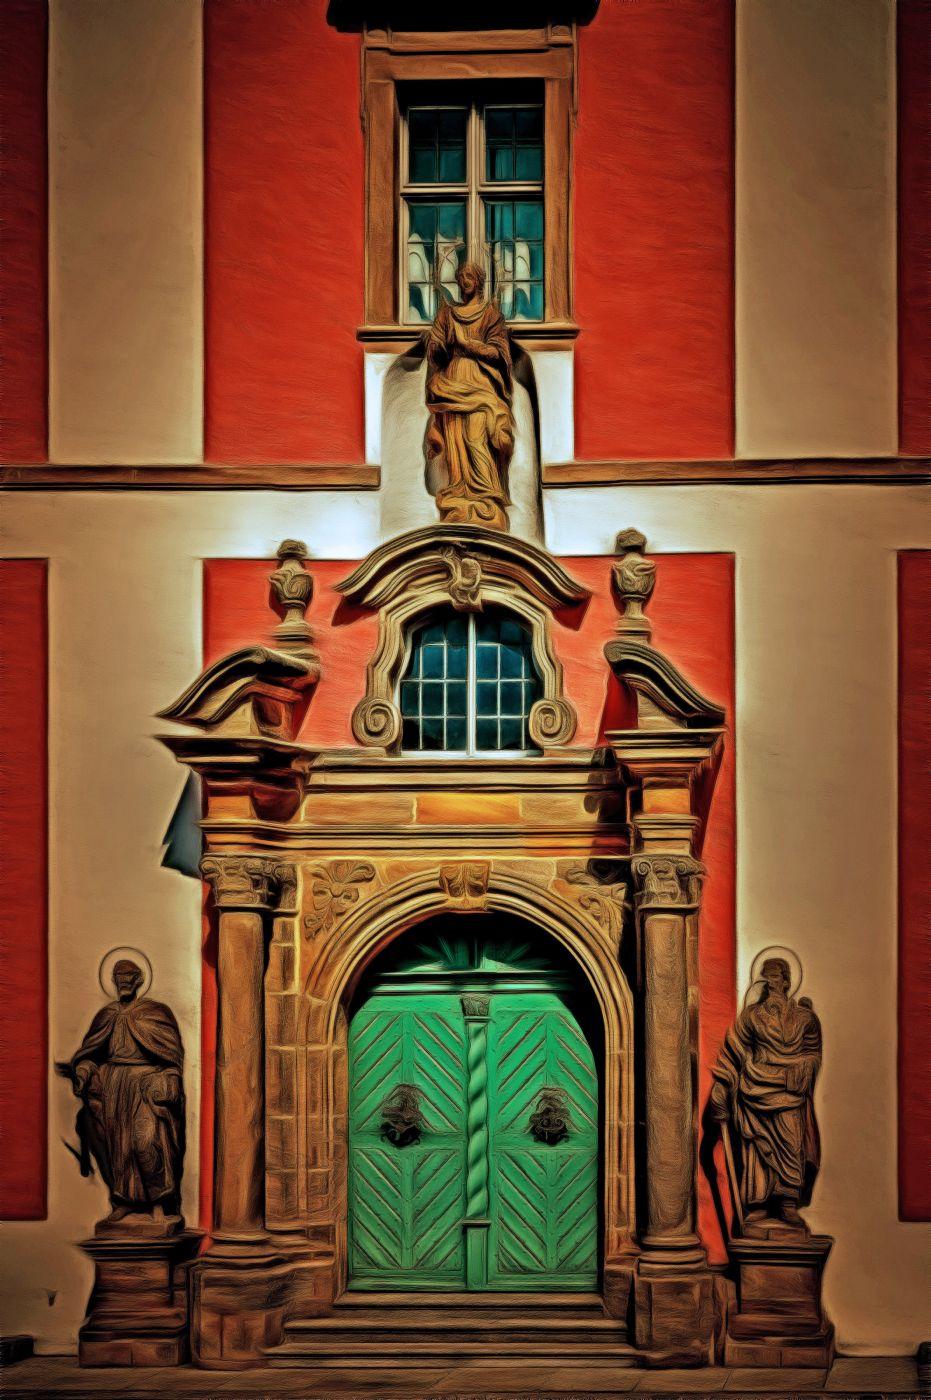 Abbey Church Speinshart (Upper Palatinate, Germany), Germany